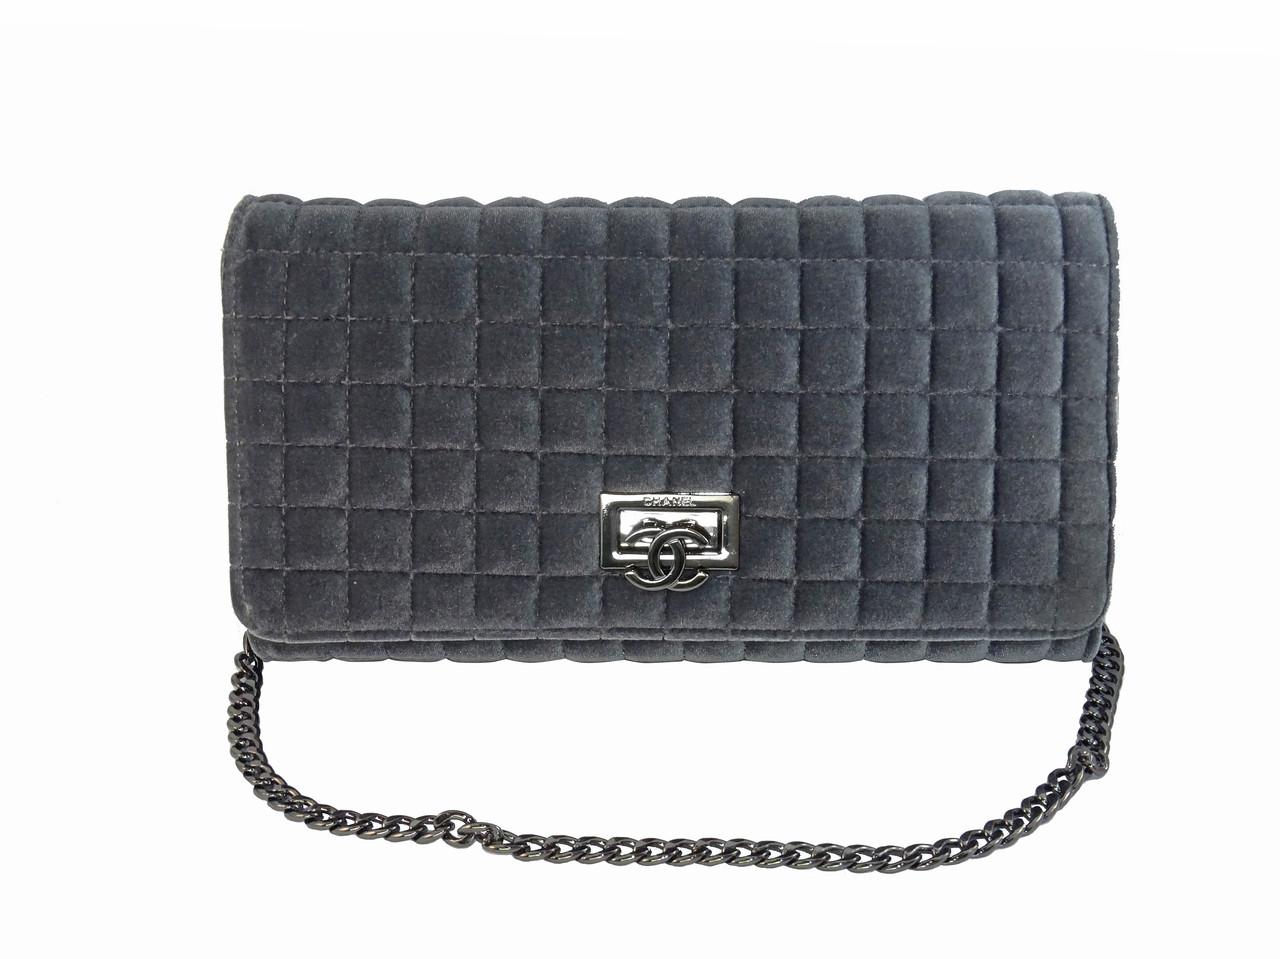 3879e70e71f9 Бархатный клатч в стиле Chanel (серый) №9968, цена 1 070 грн ...